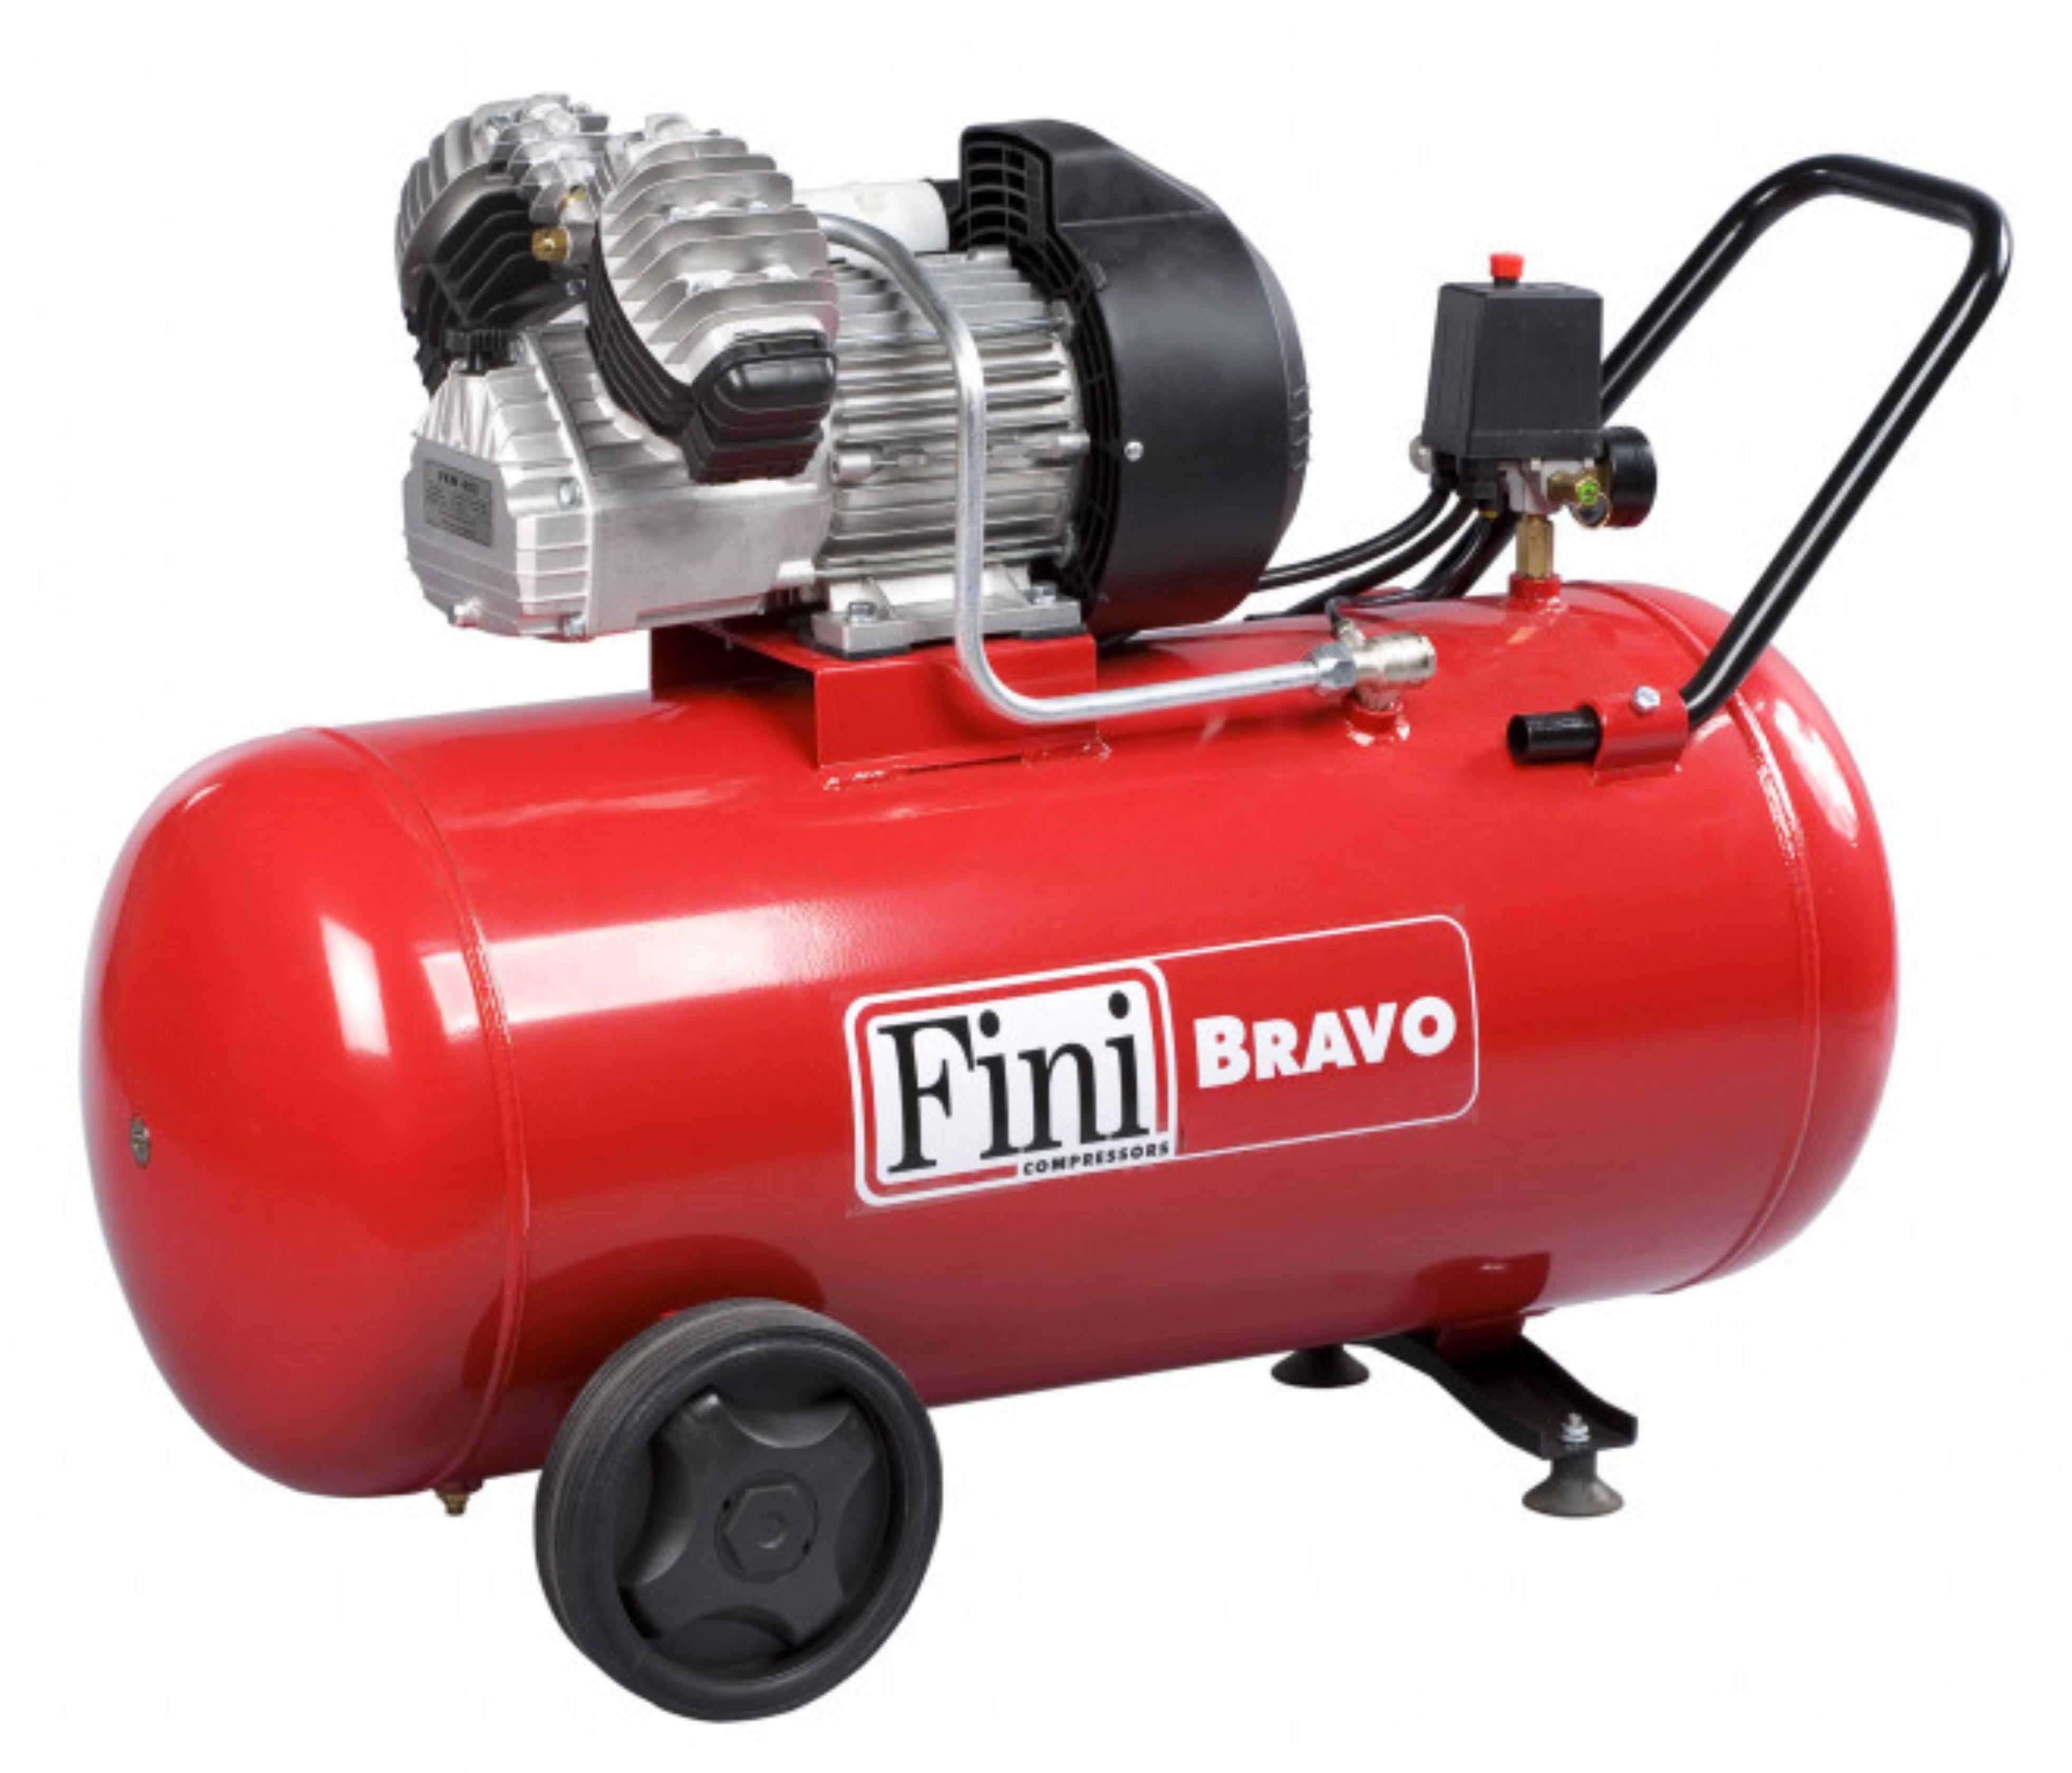 Bravo kompresszorok (2,2-3 kW)